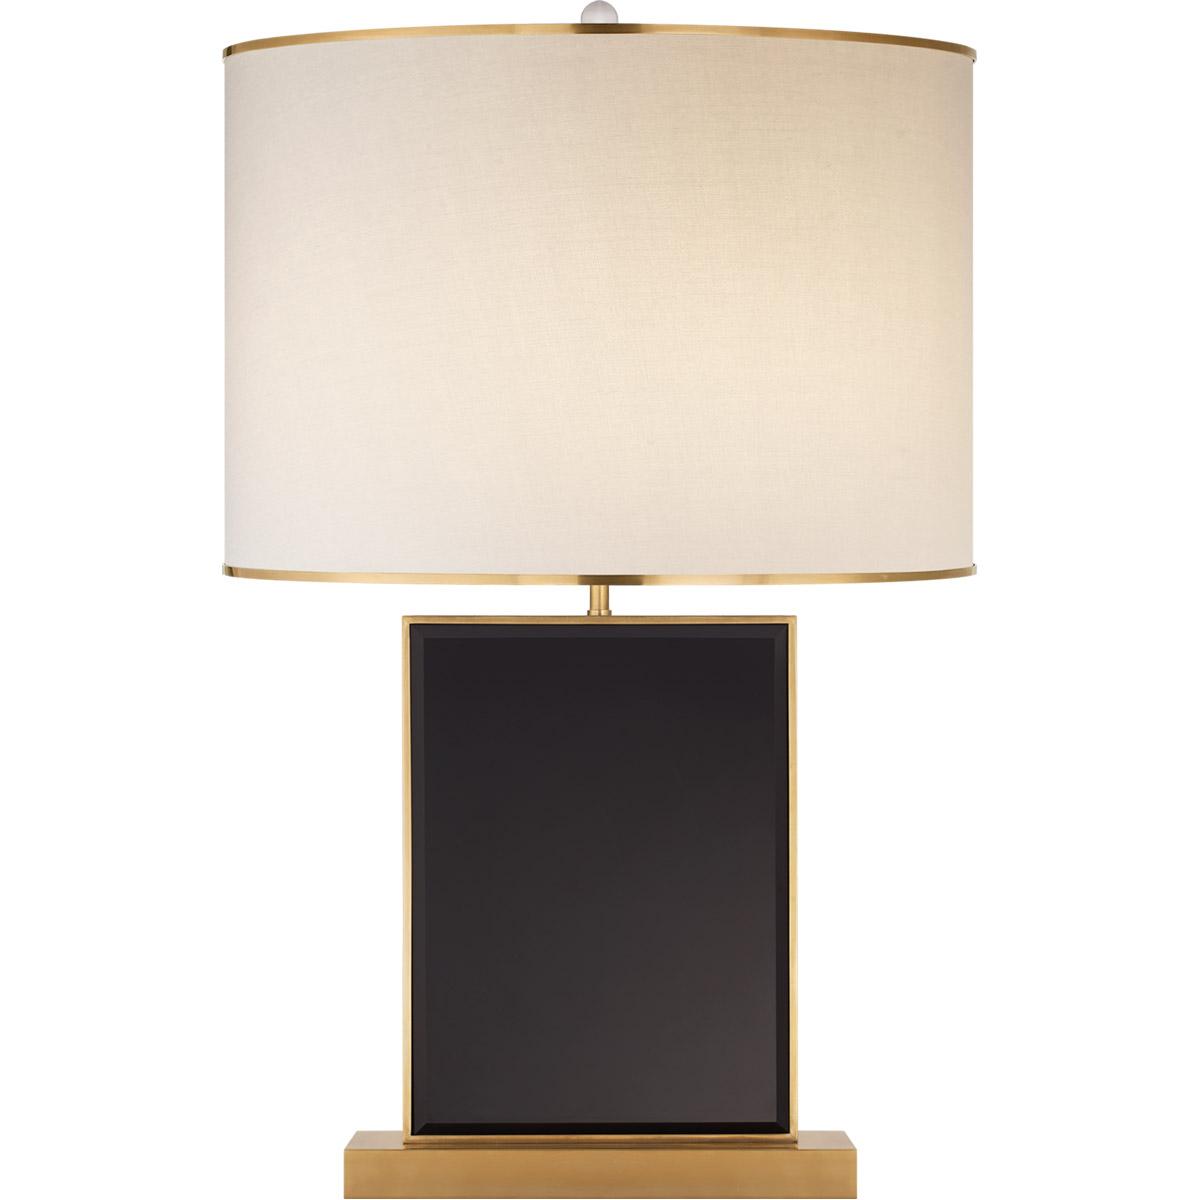 Bradford Large Table Lamp